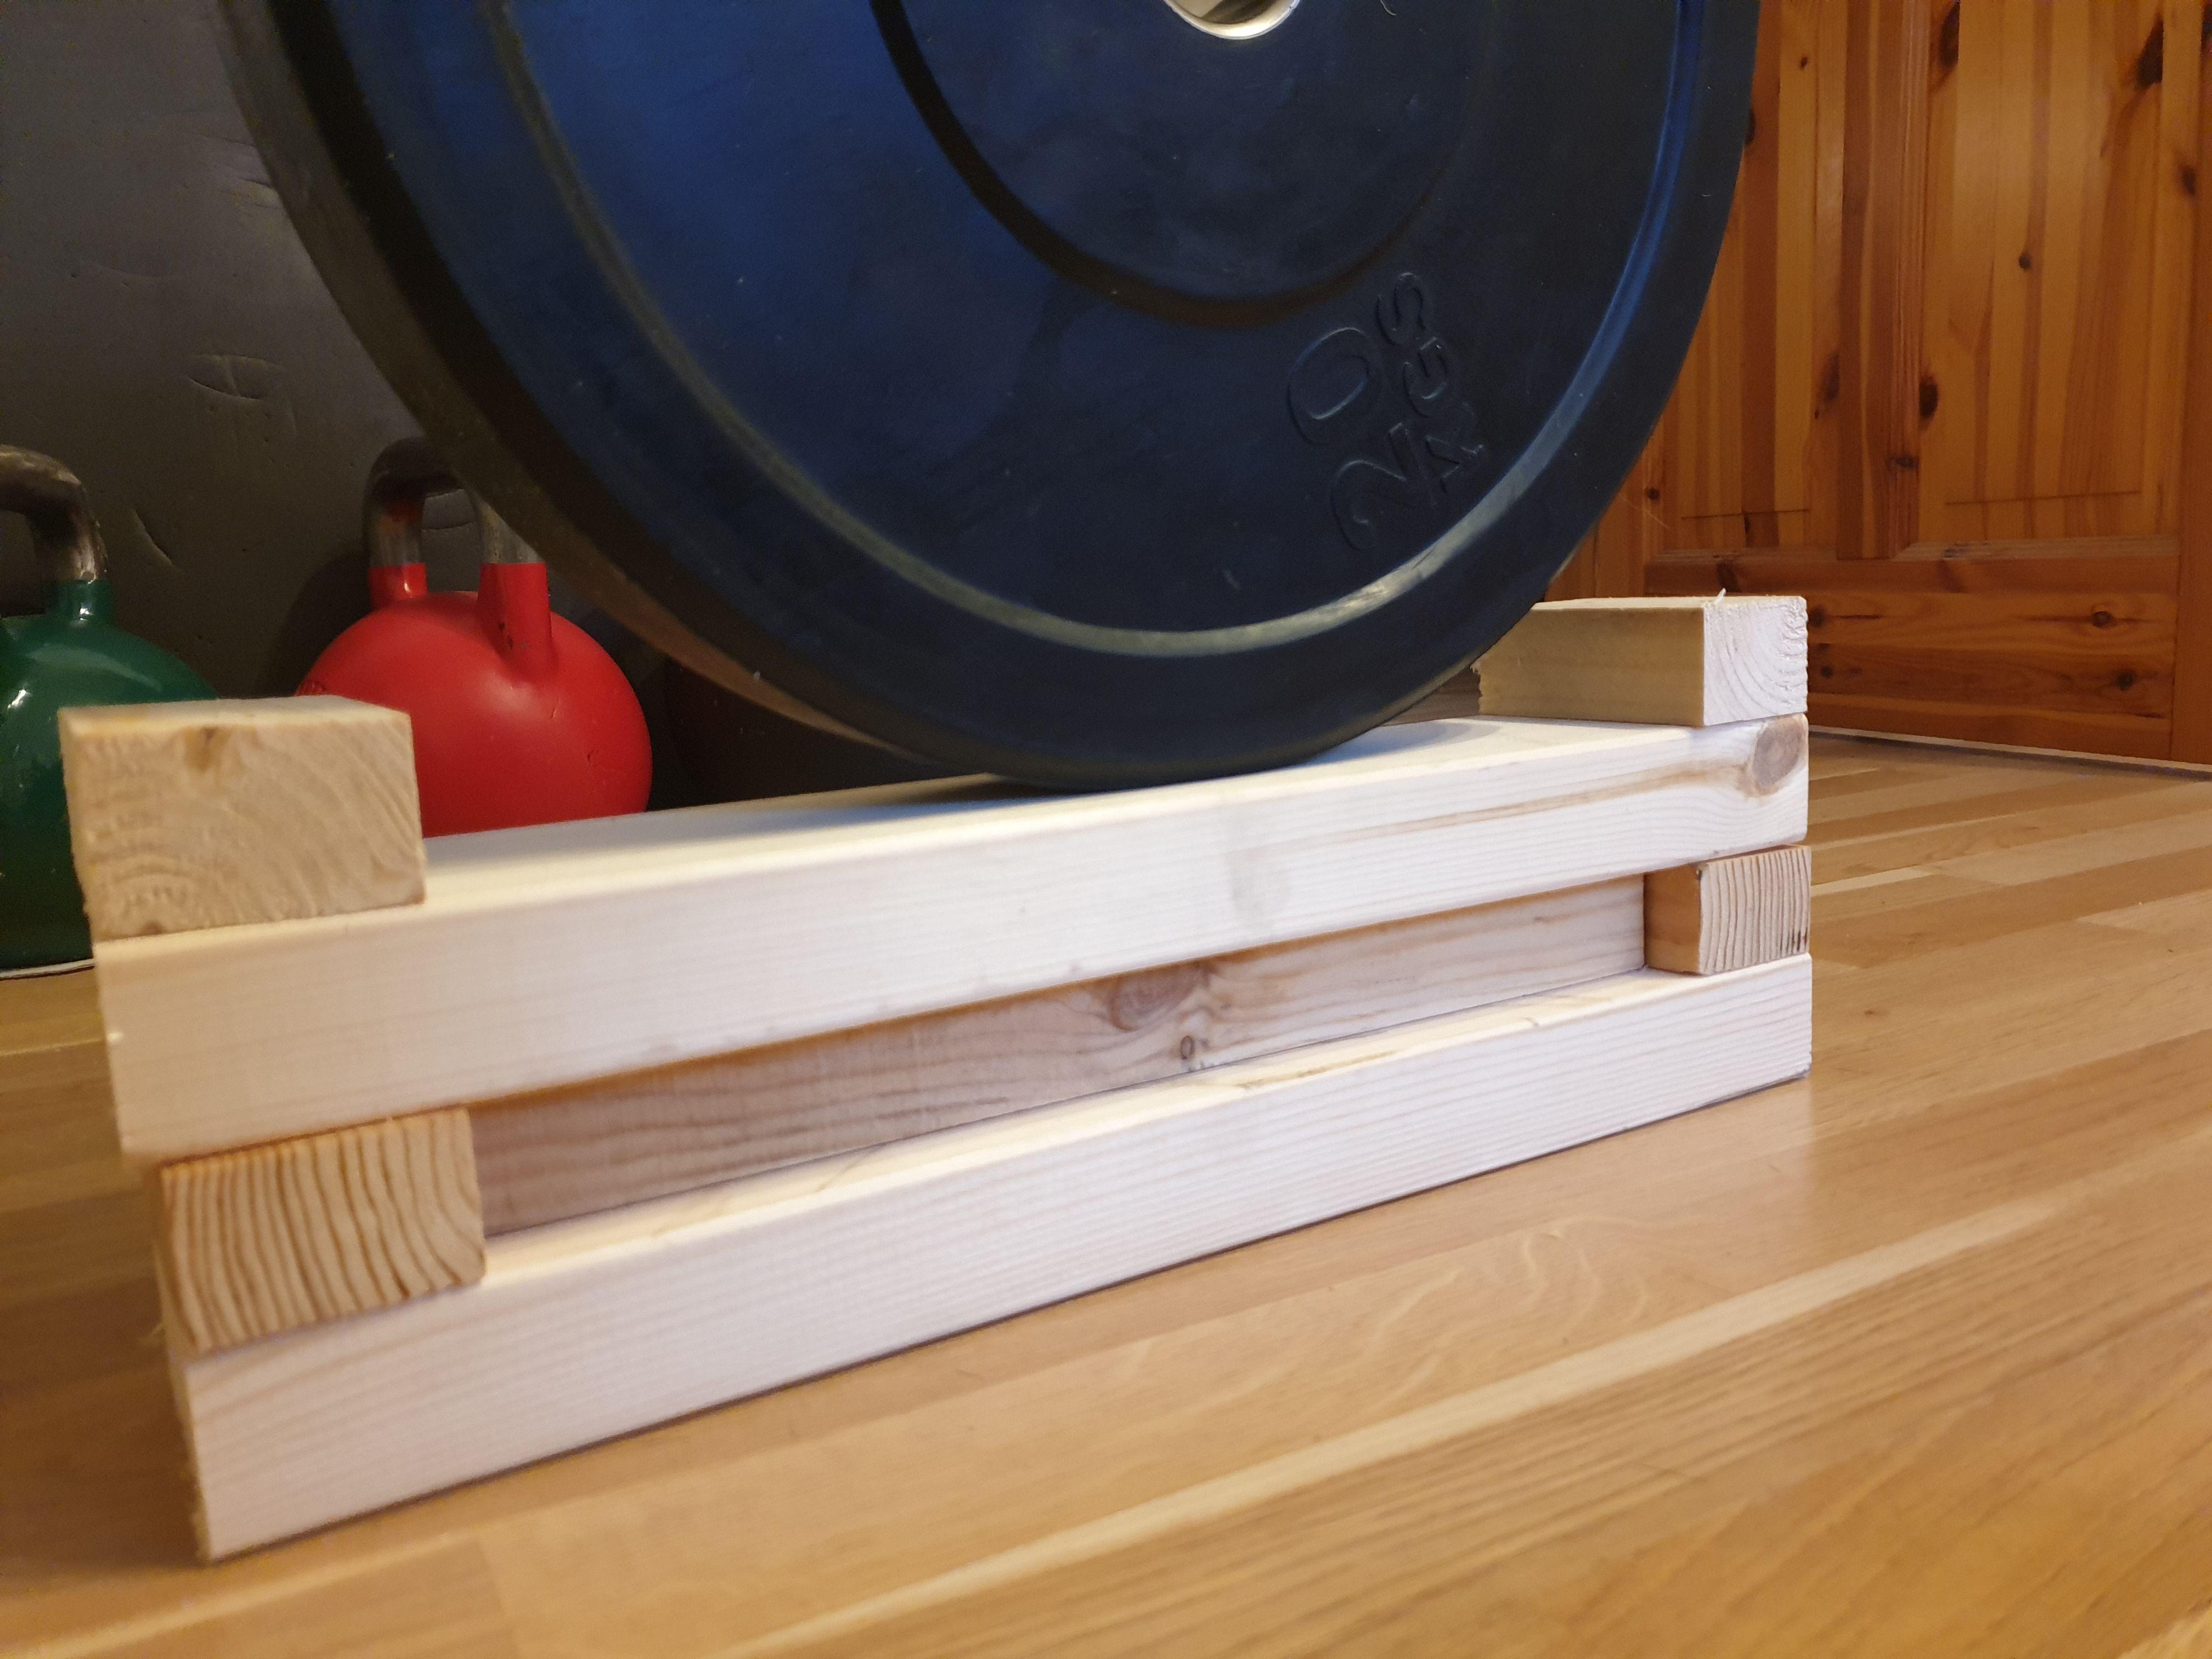 Diy Deadlift Blocks For Elevated Deadlifts Stackable Diy Blocks At Home Gym Deadlift